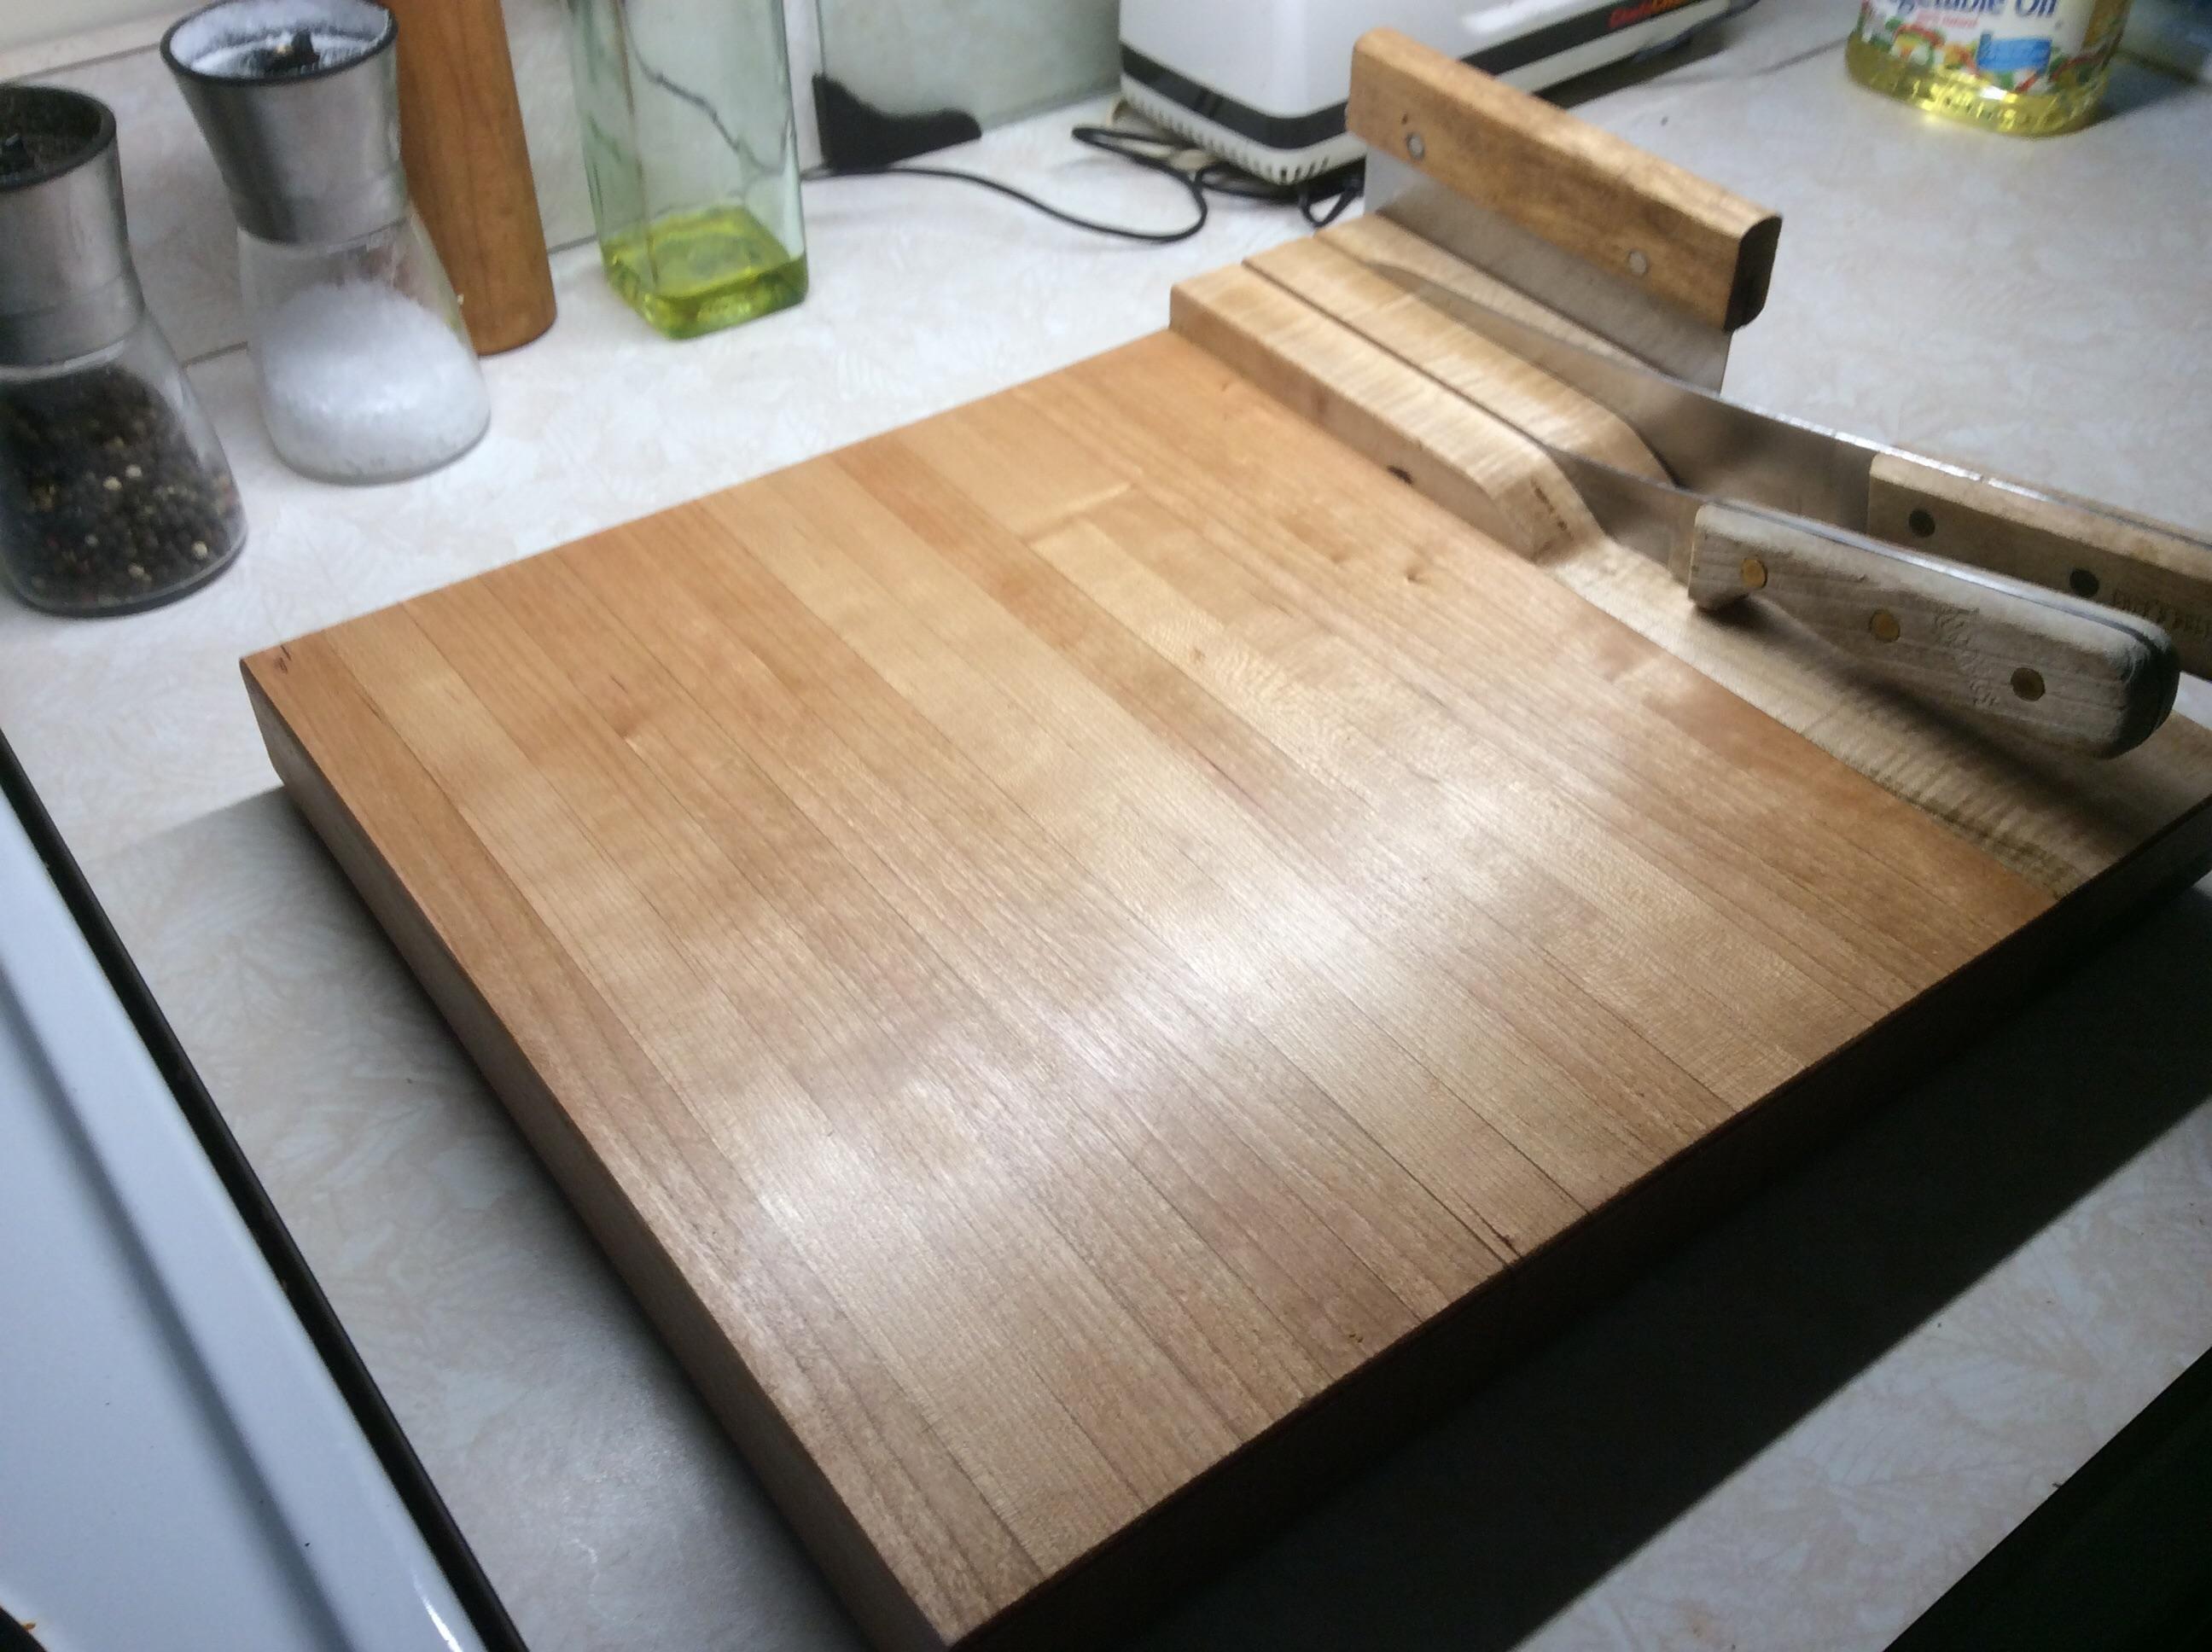 Magnetic Knife Storage Cutting Board.